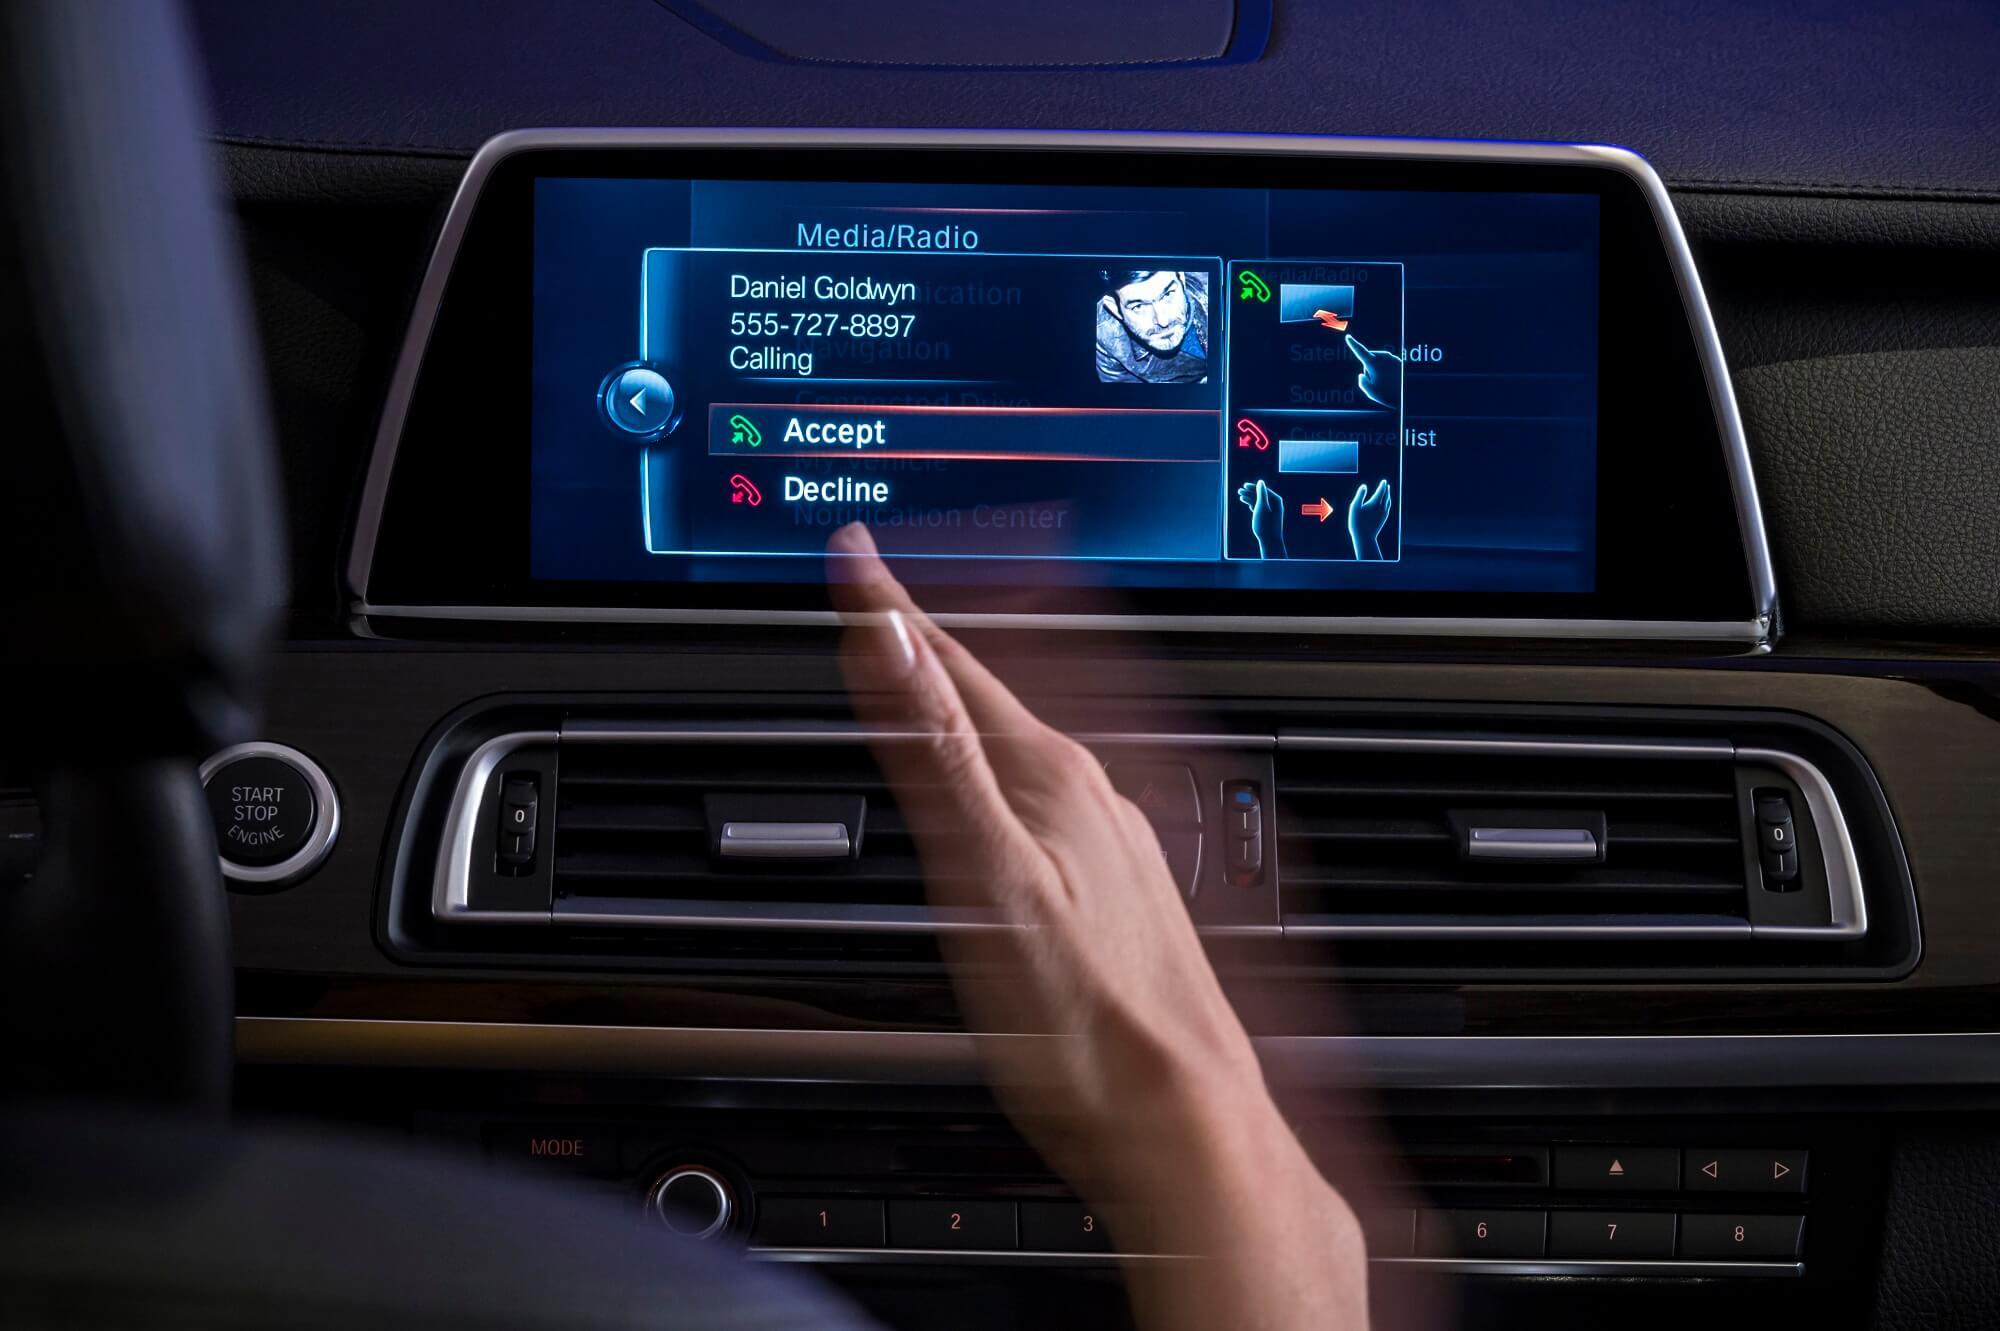 Ecrã controlo por gestos